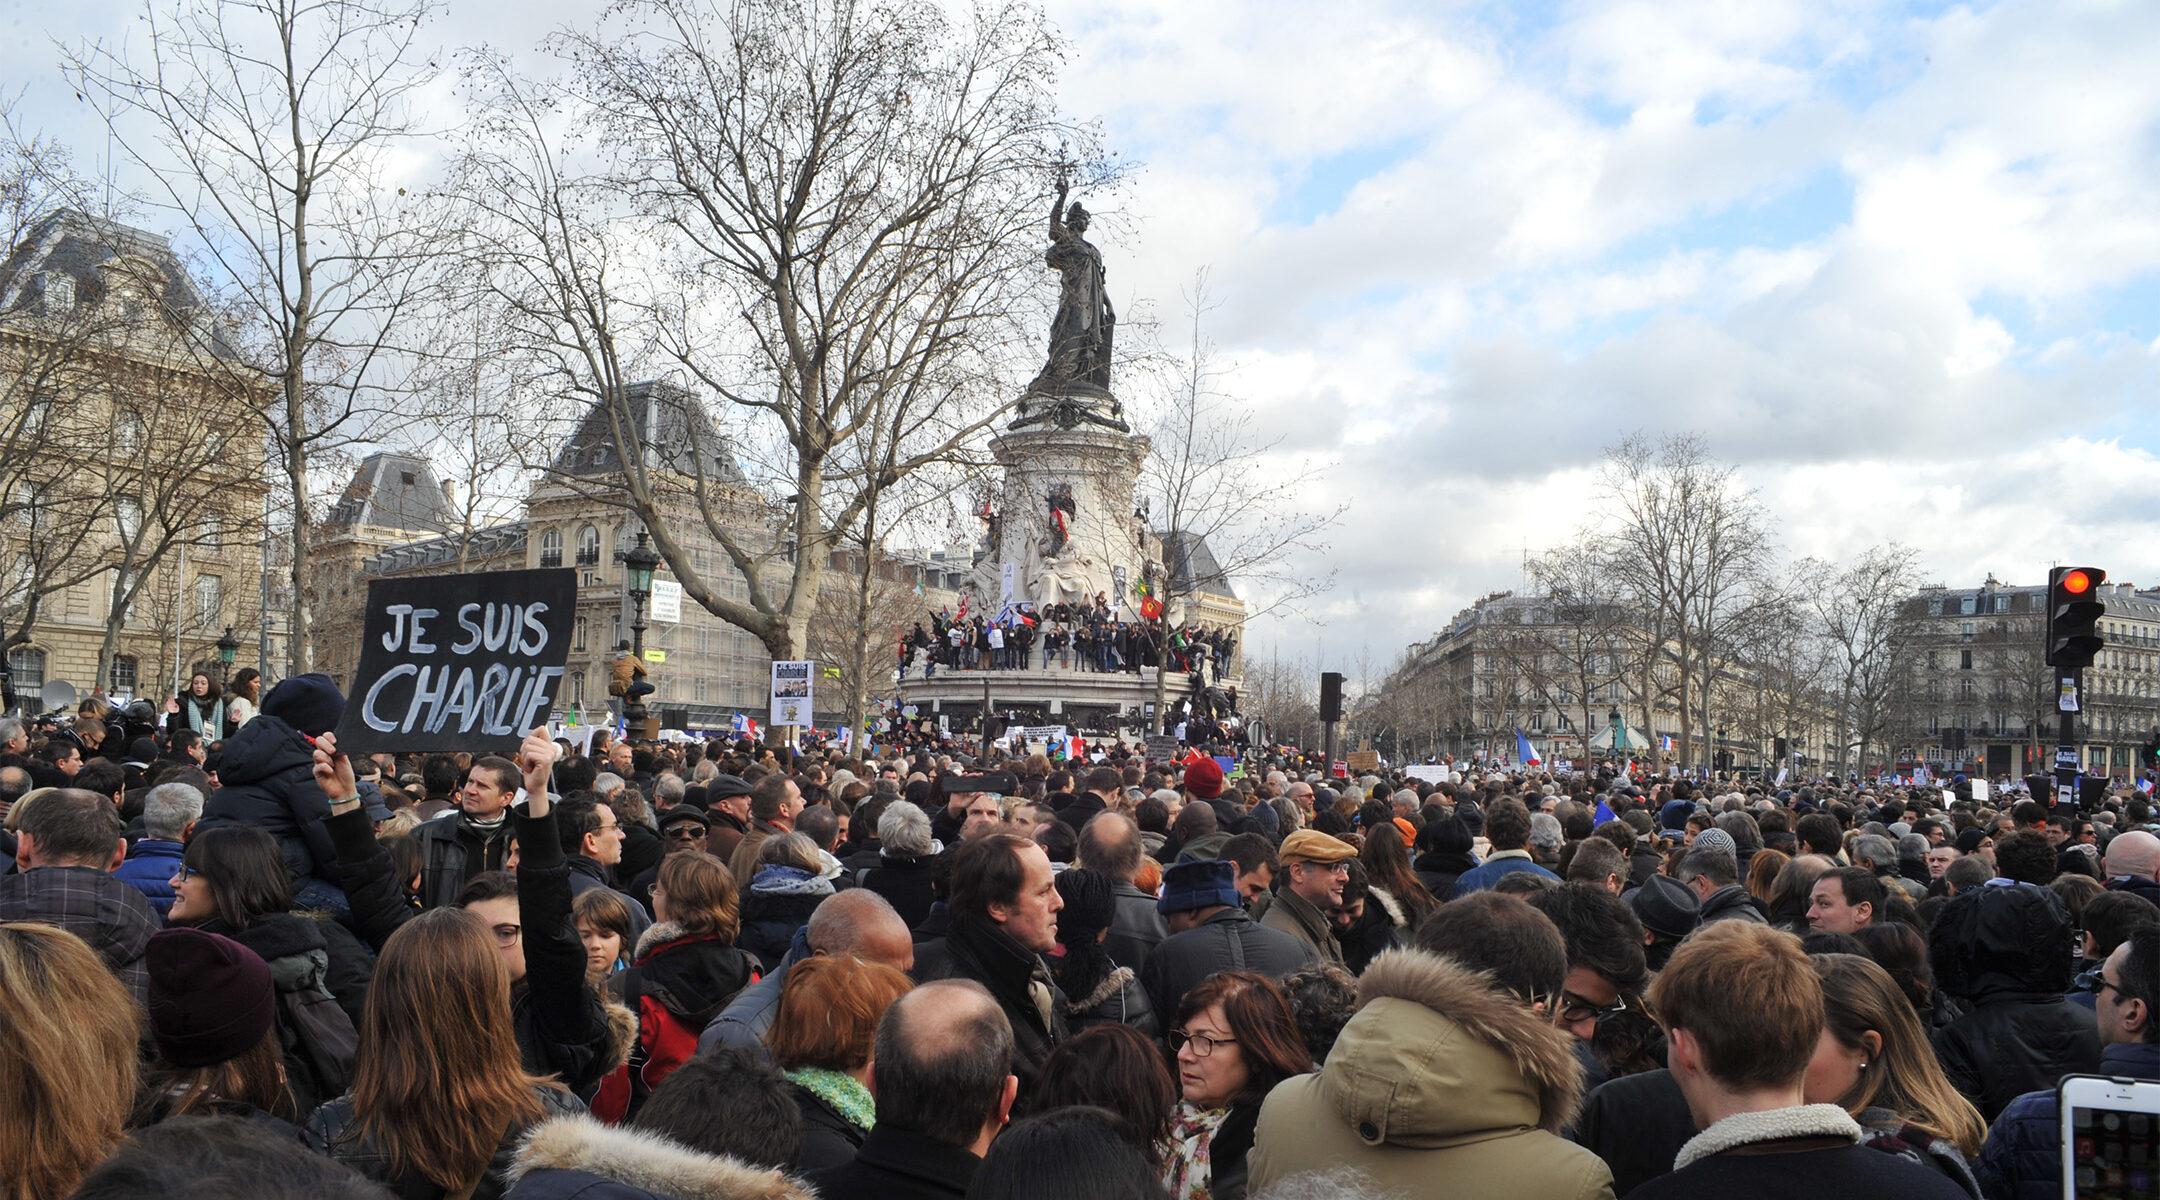 Protesters march through Paris on Jan. 11, 2015. (Wikimedia Commons/Sébastien Amiet)